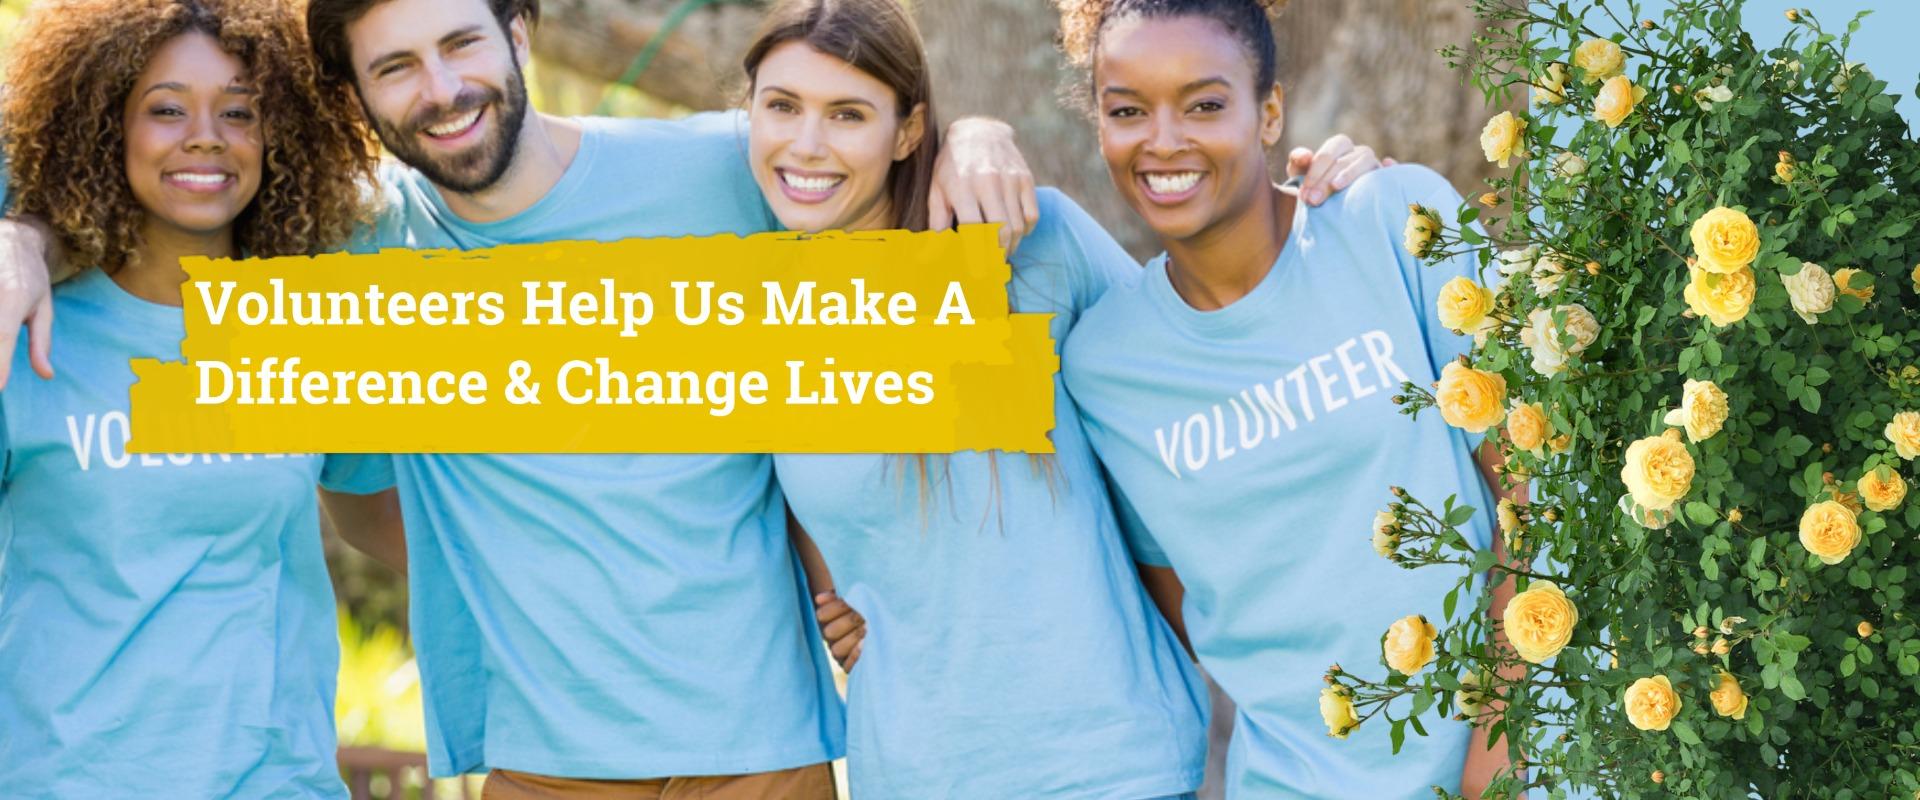 WSP - Get involved